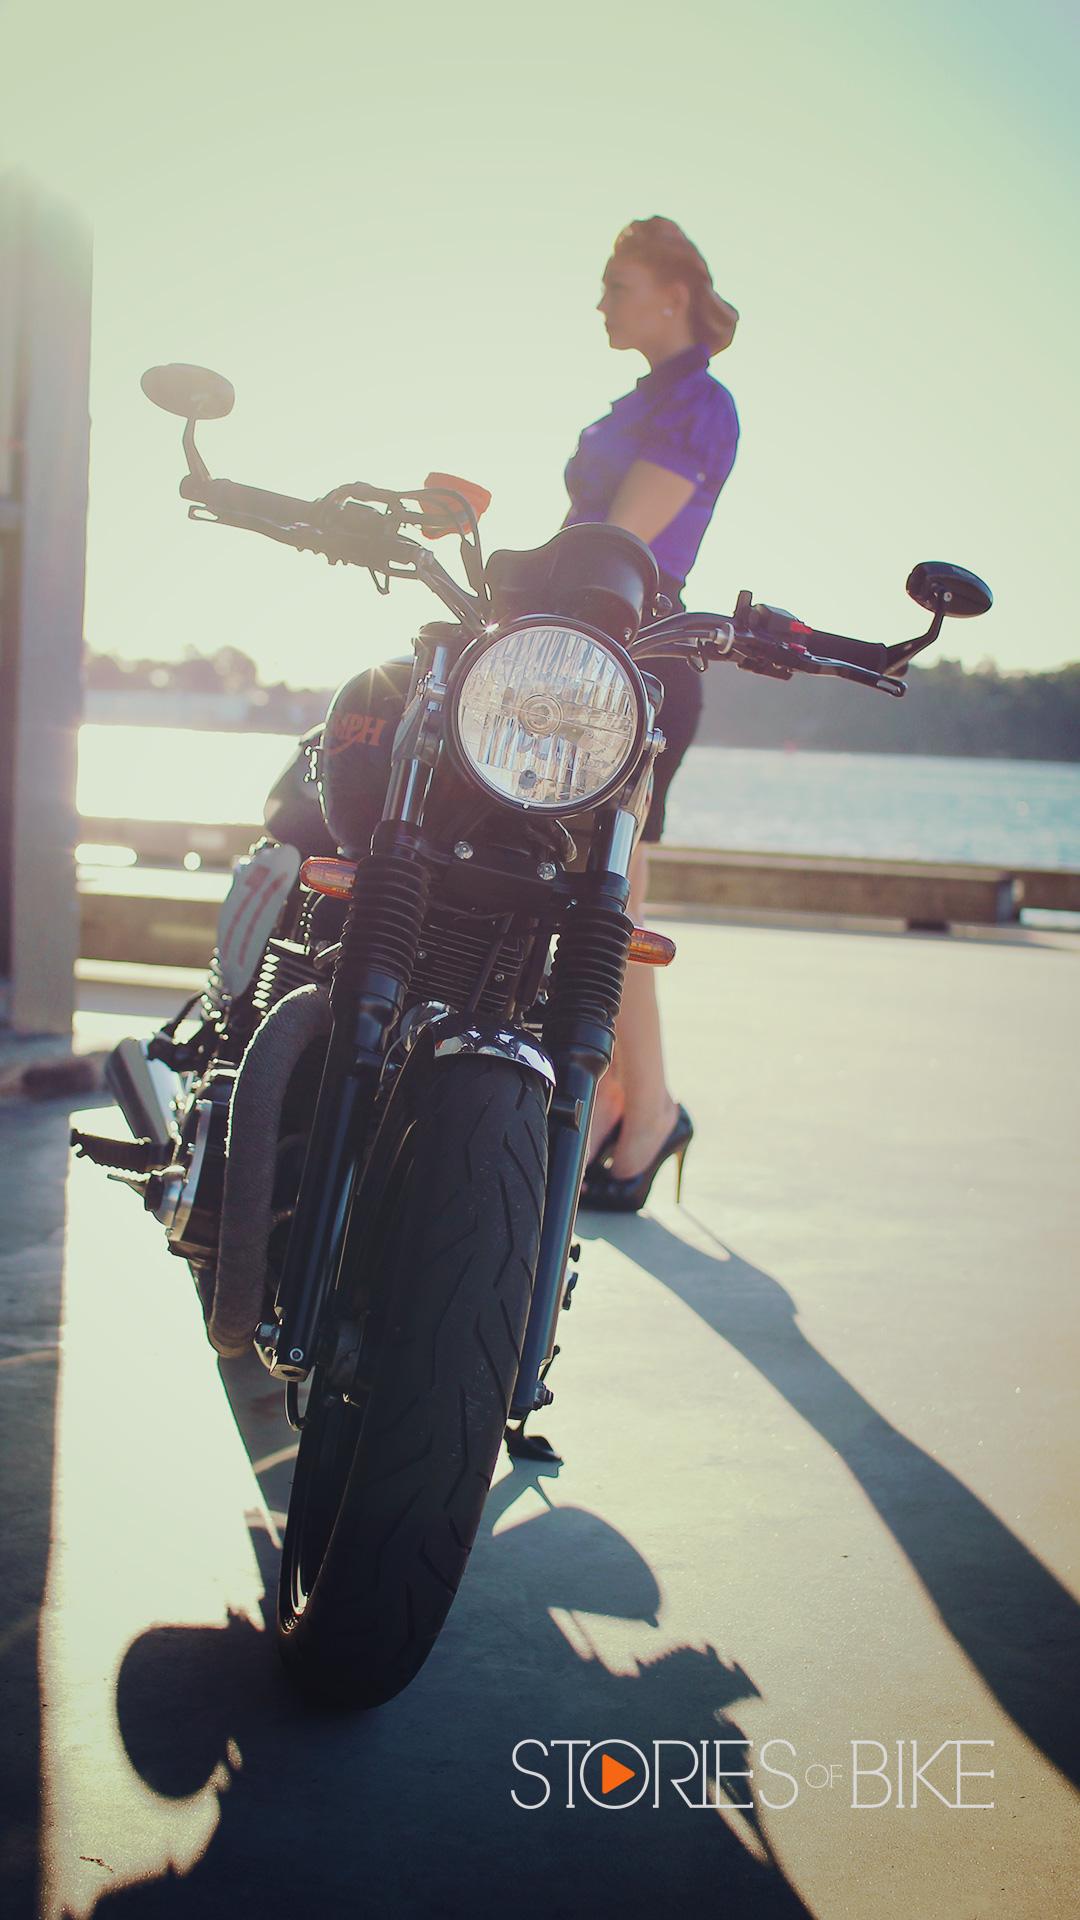 Stories_Of_Bike_Episode6_11.jpg